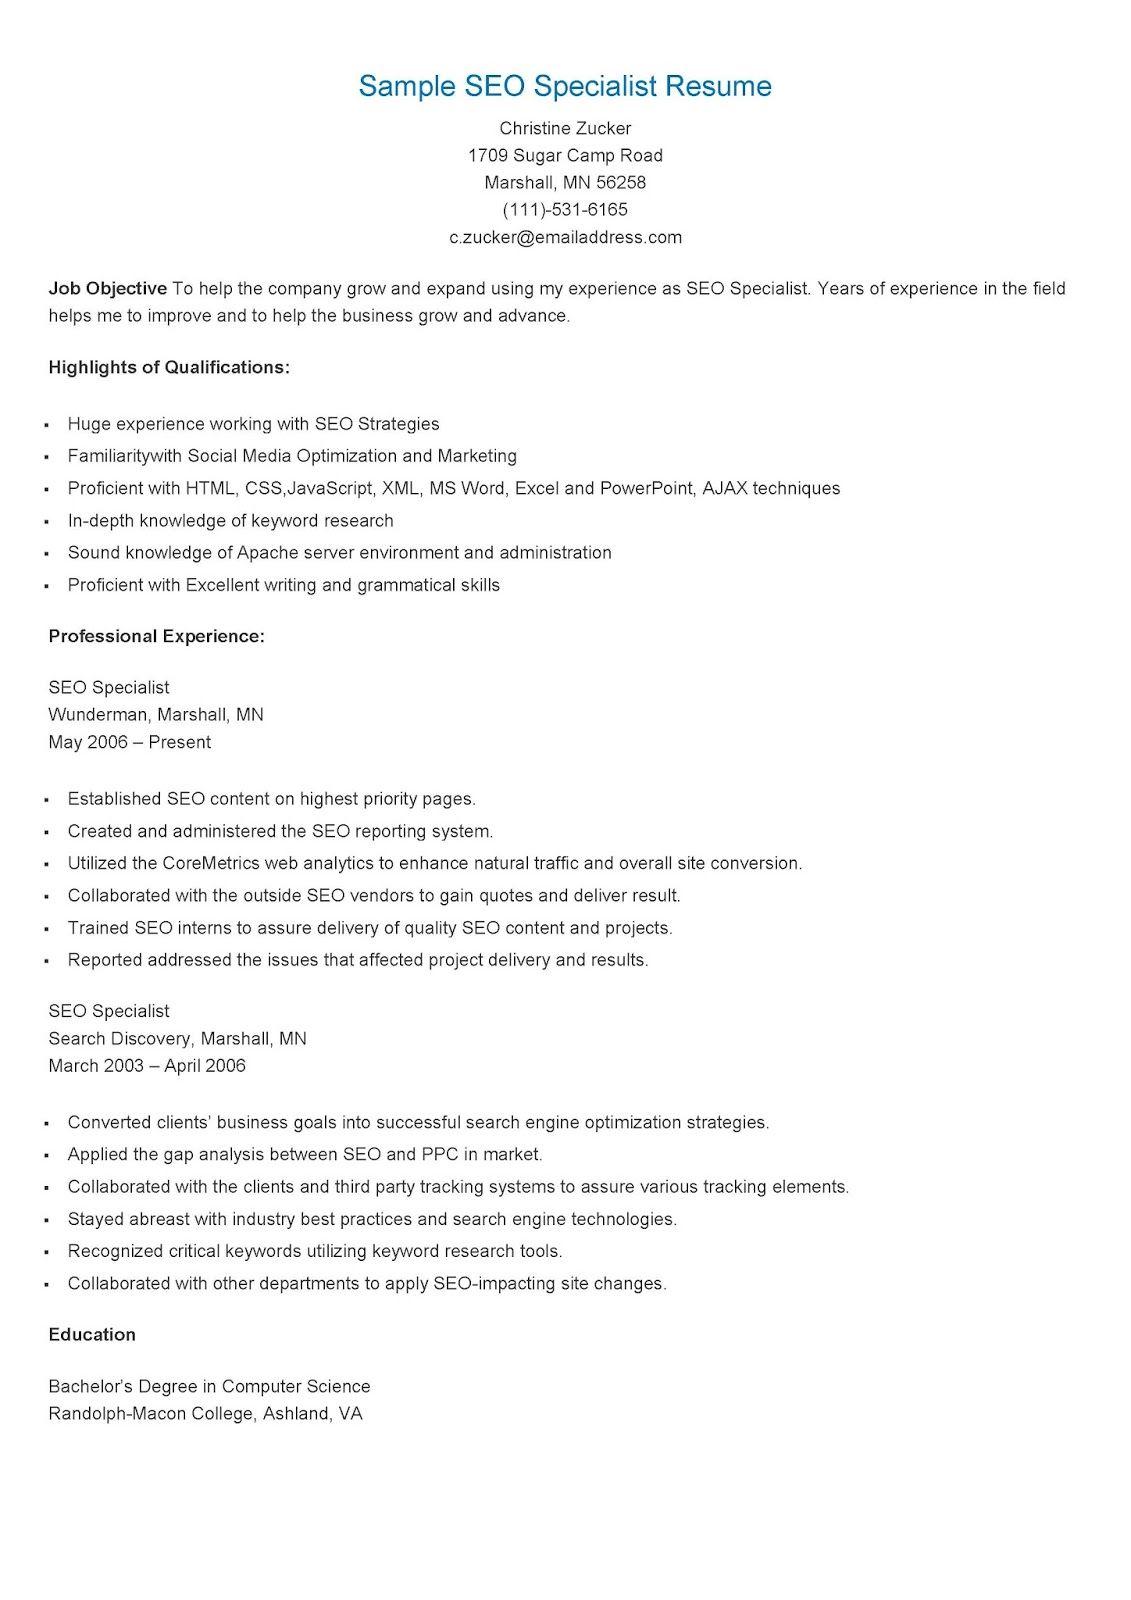 Sample Seo Specialist Resume Seo Specialist Resume Seo Expert